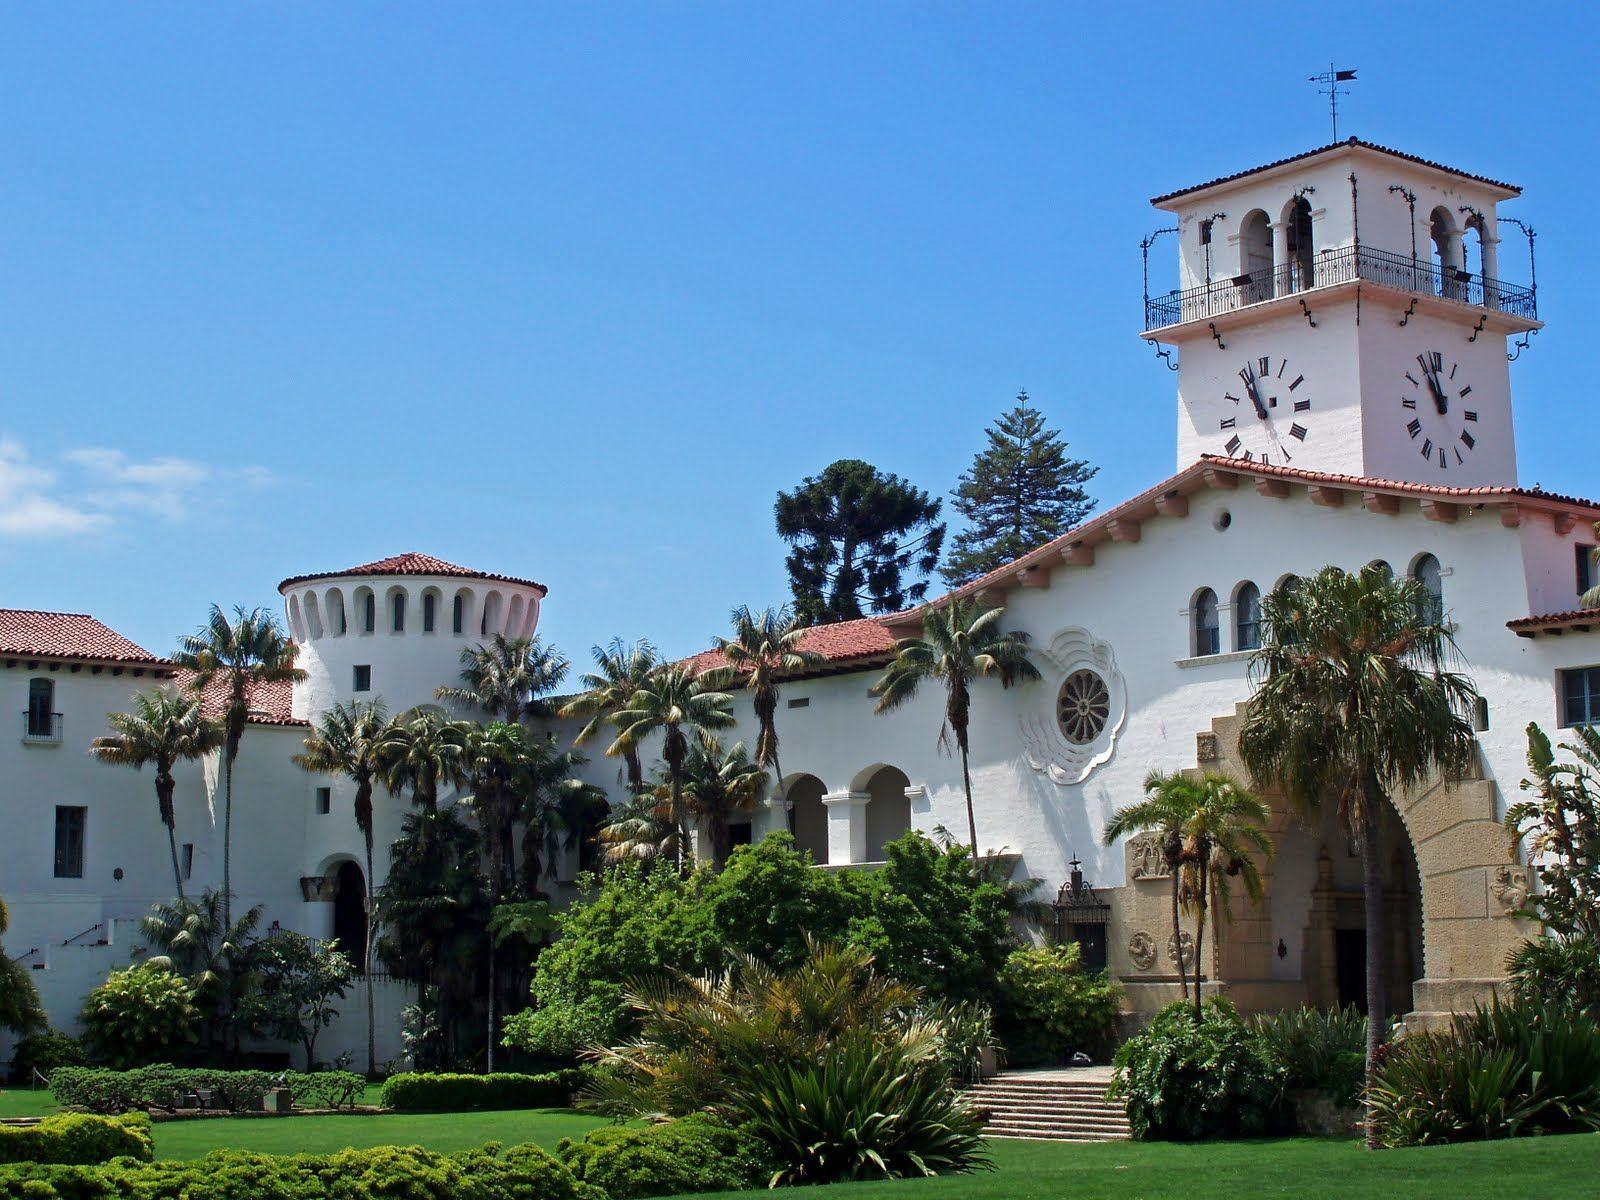 Local Single Women Seeking Men In Santa Barbara, California, United States